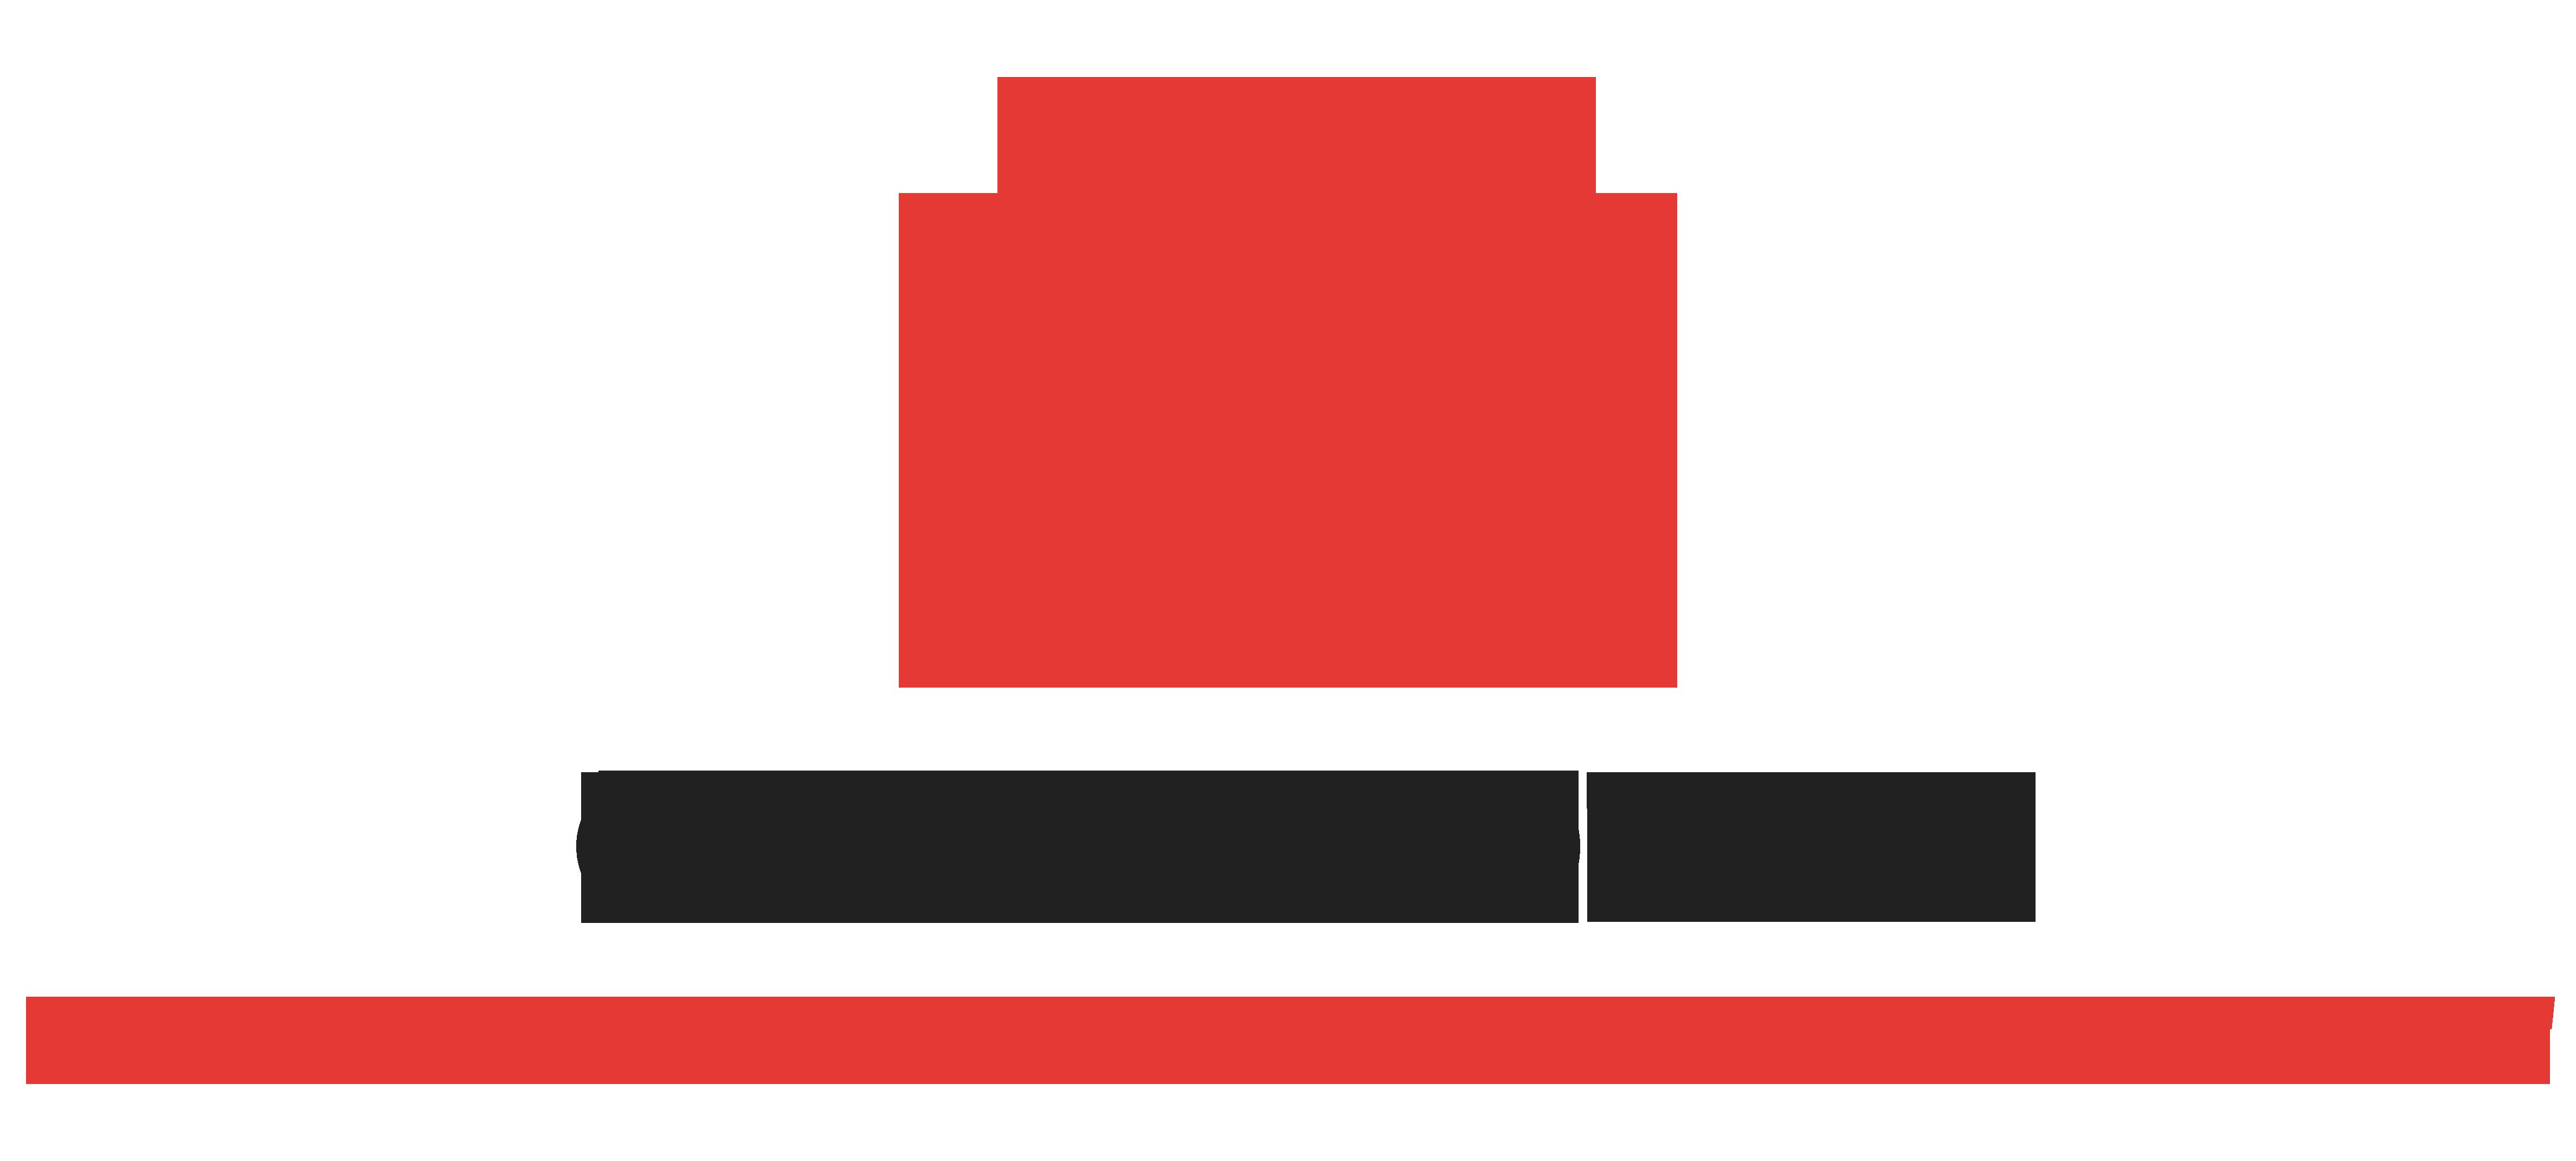 510-444-9191 : Airport taxi cab - Town car service Oakland CA